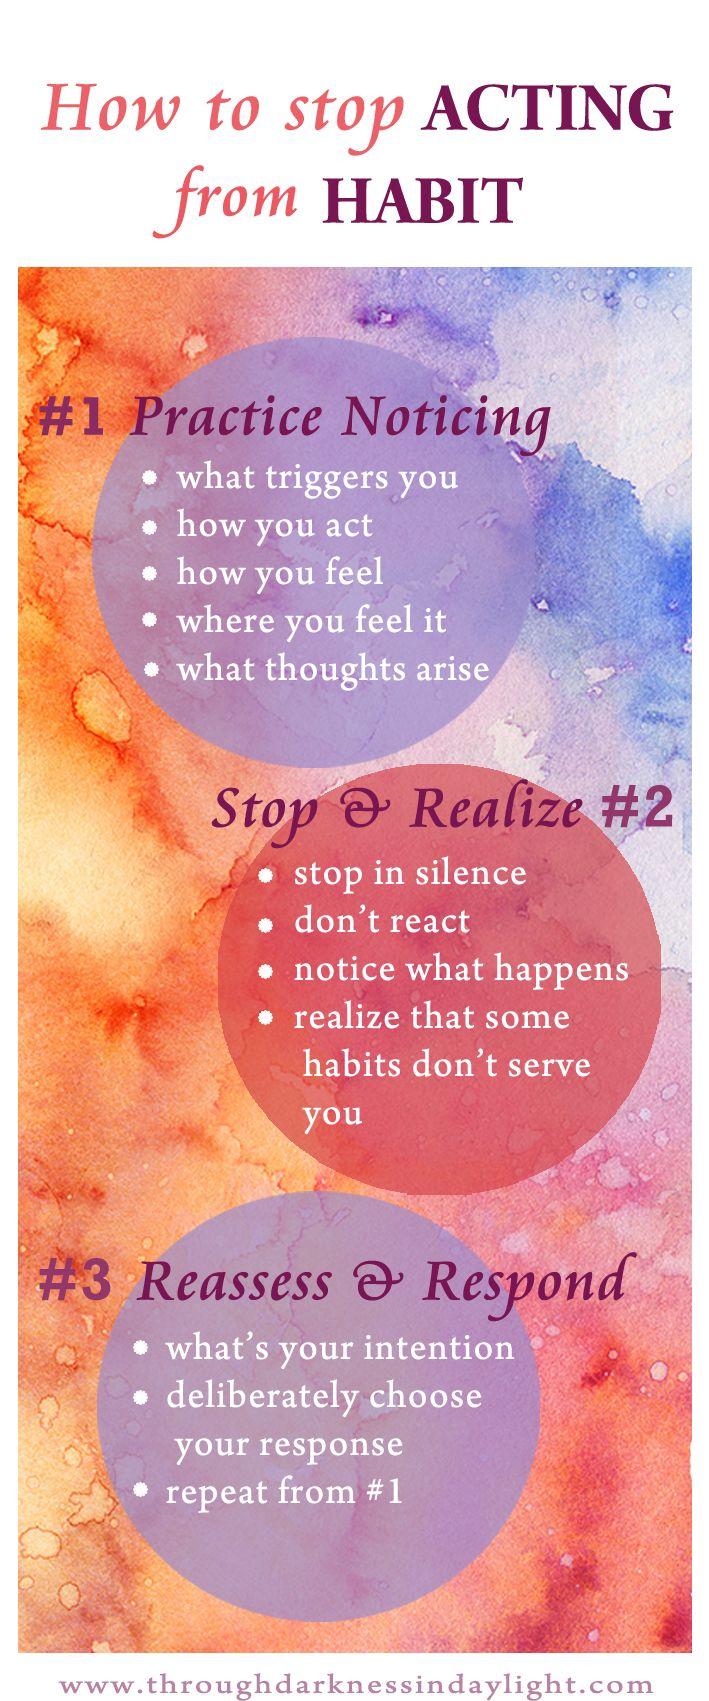 Stop reacting from habit